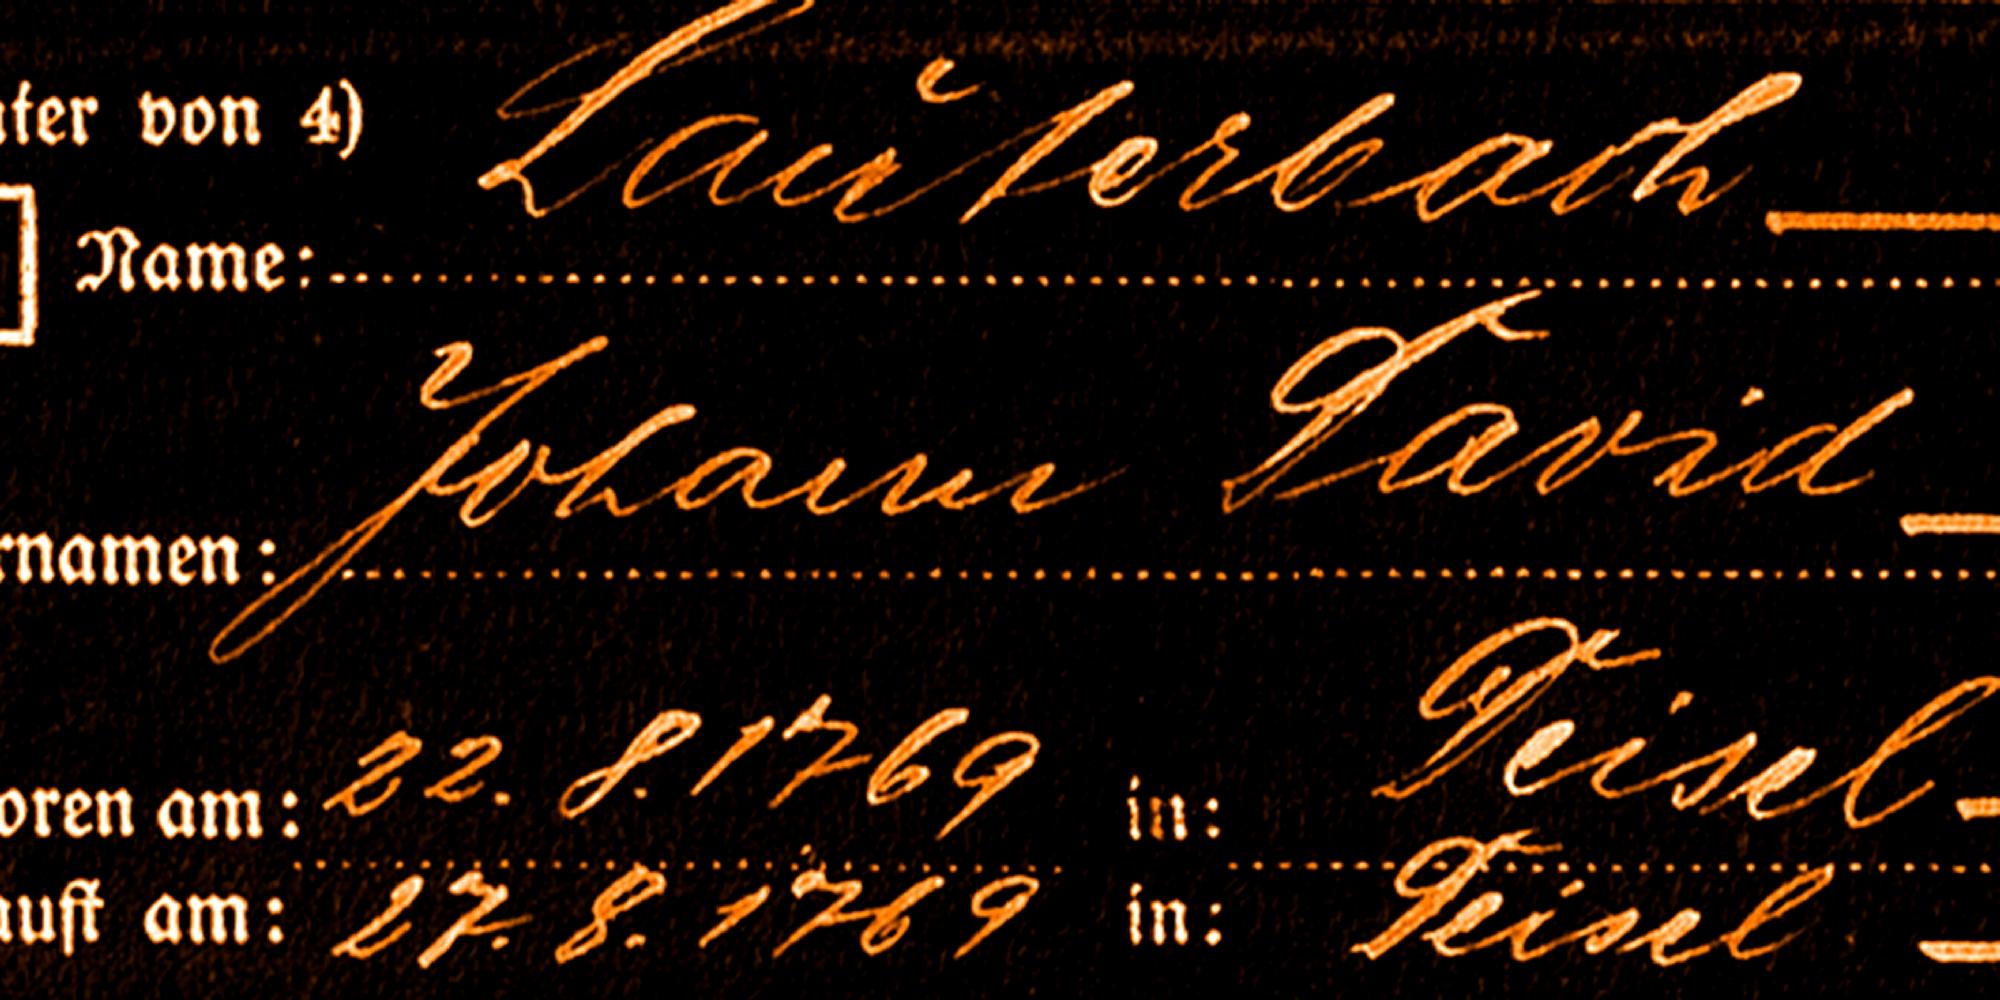 Ahnenforschung Lauterbach Deissel Hessen - Veckerhagen, Vaake, Trendelburg, Paul, Lossin, Lauterbach, Köster, Koch, Hofedietz, Hillebrand, Hessen, Hauk, Gräbe, Gottsbüren, Goebel, Gödecke, Dettmar, Deisel